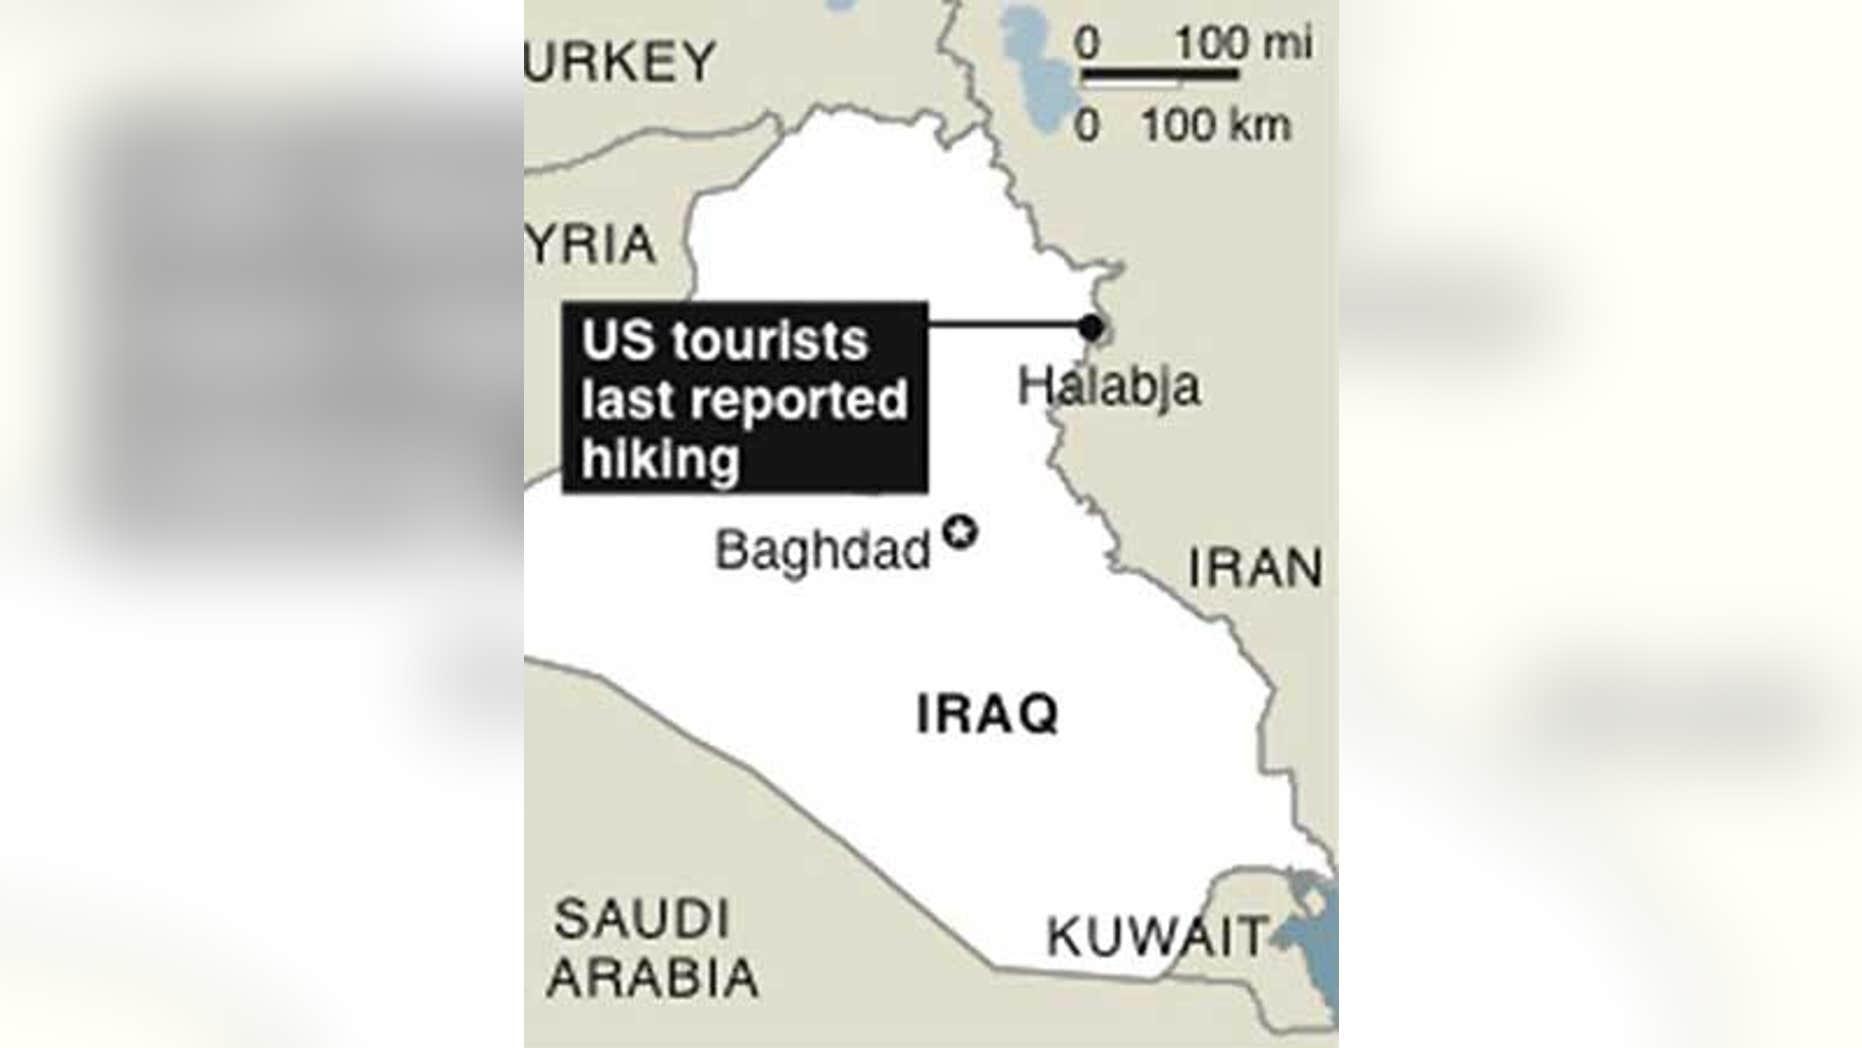 Map locates Halabja, Iraq, where US tourists last reported hiking.